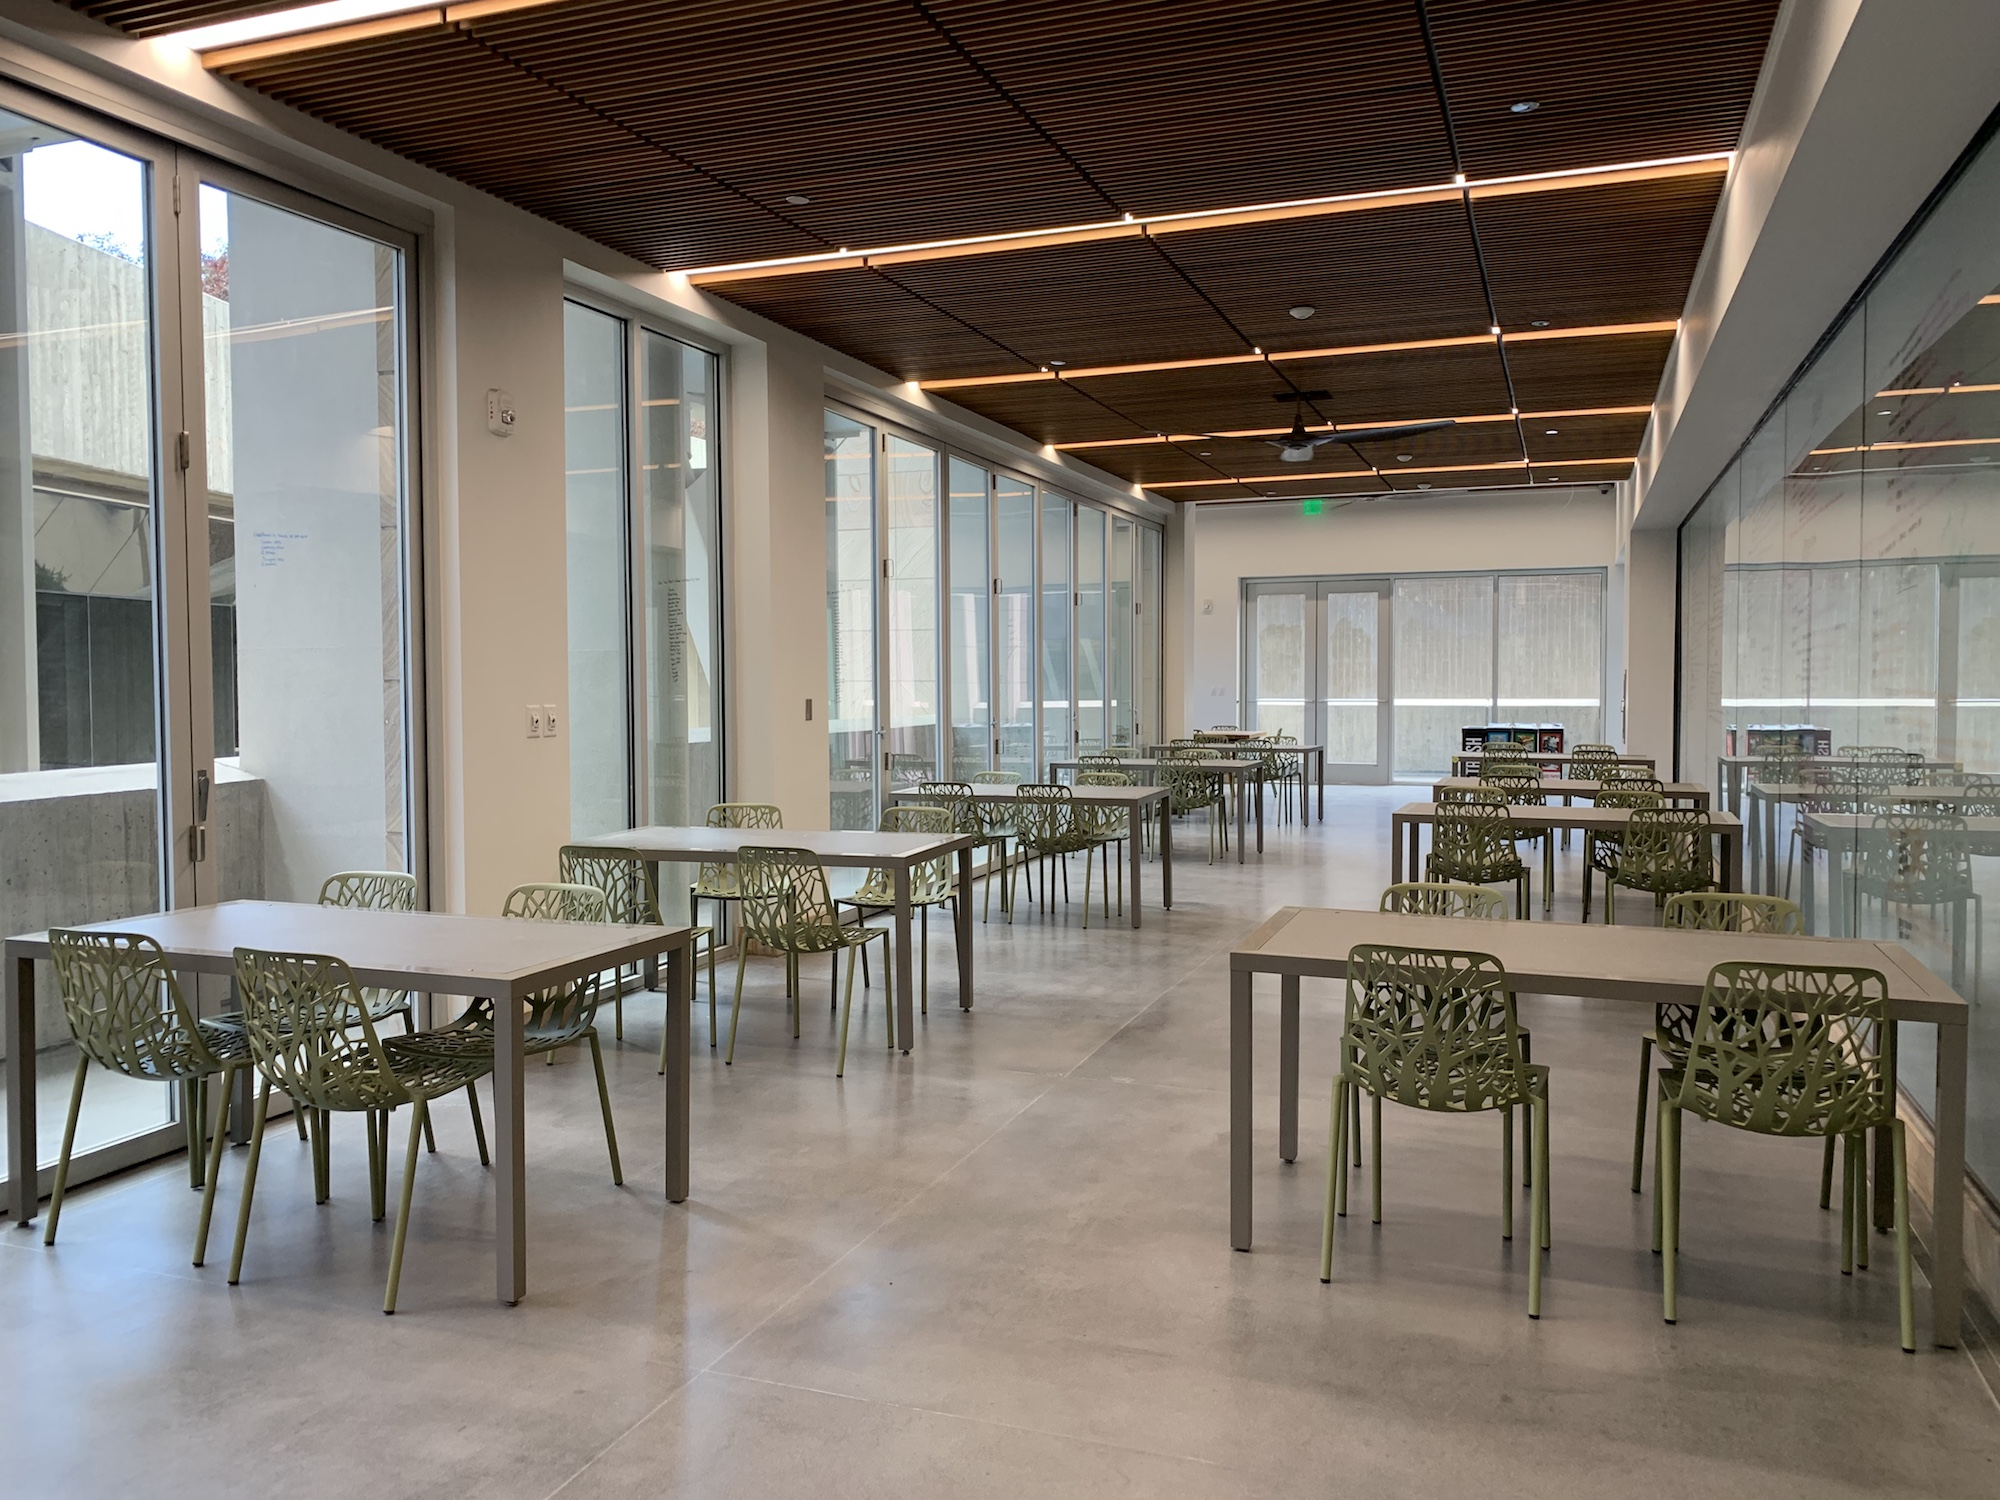 The new desks in the indoor area of Katherine's Courtyard.